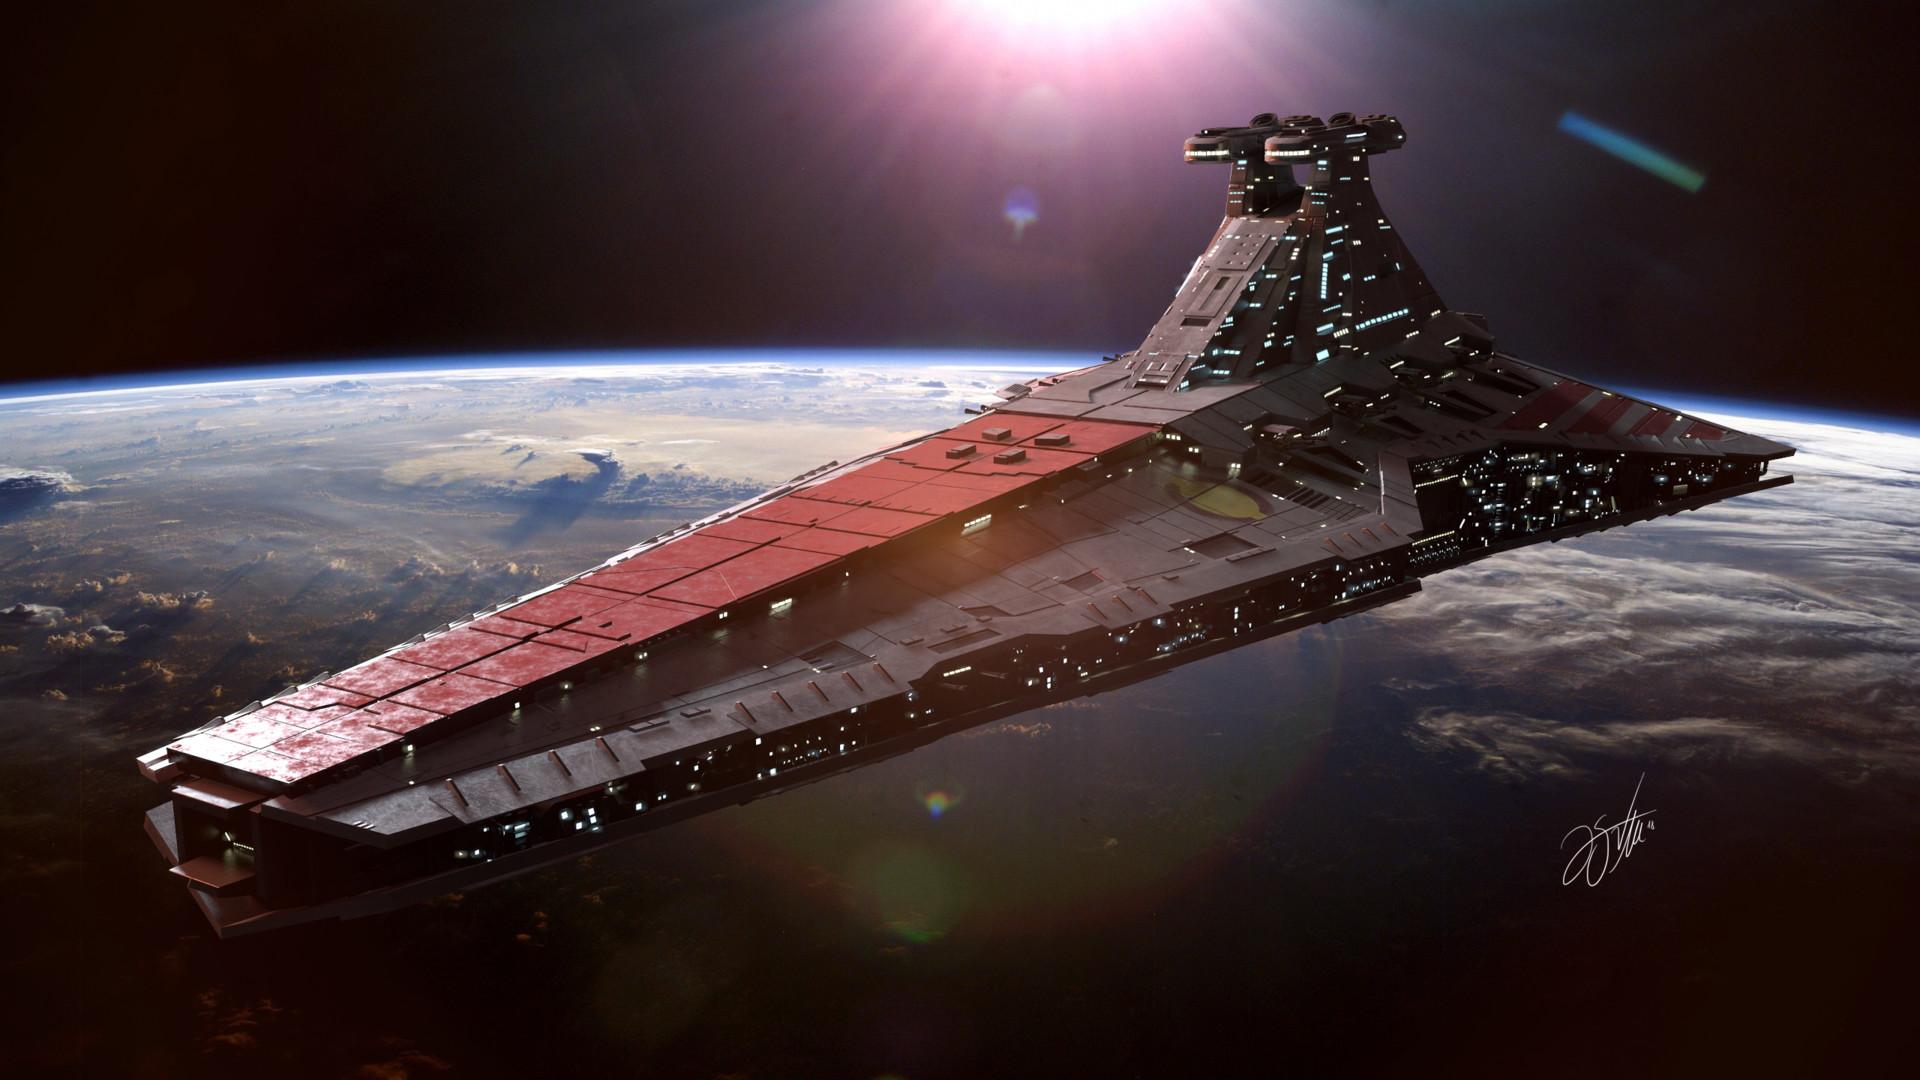 Venator Class Star Destroyer Wallpaper Posted By Ryan Peltier